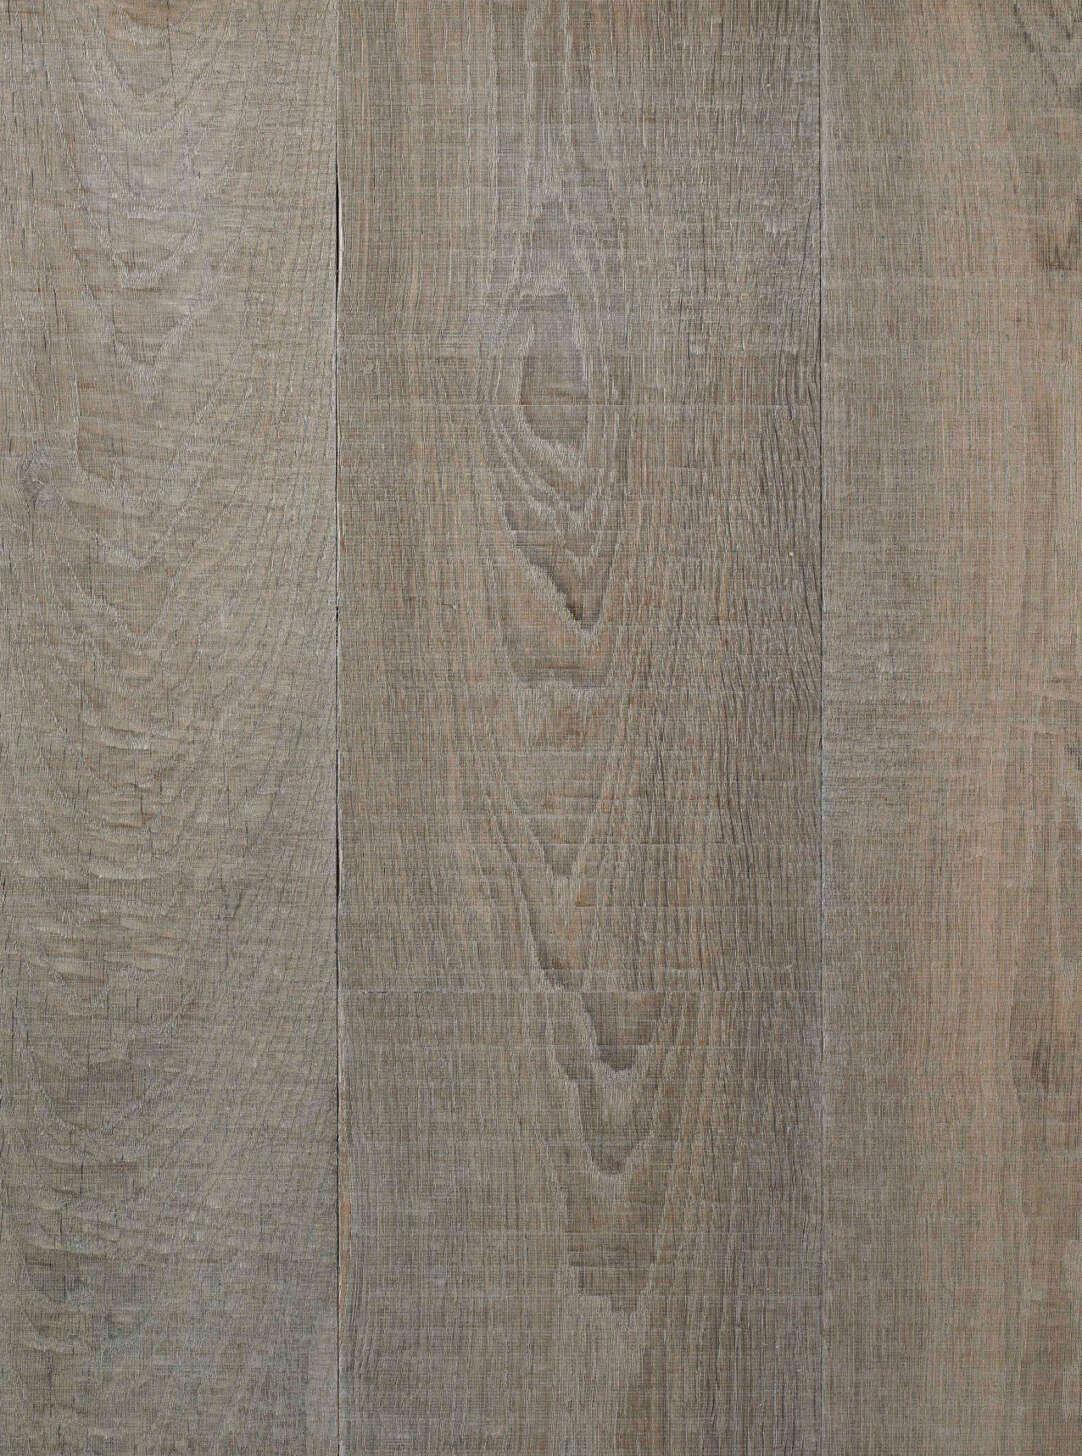 Oak tate tiree plank